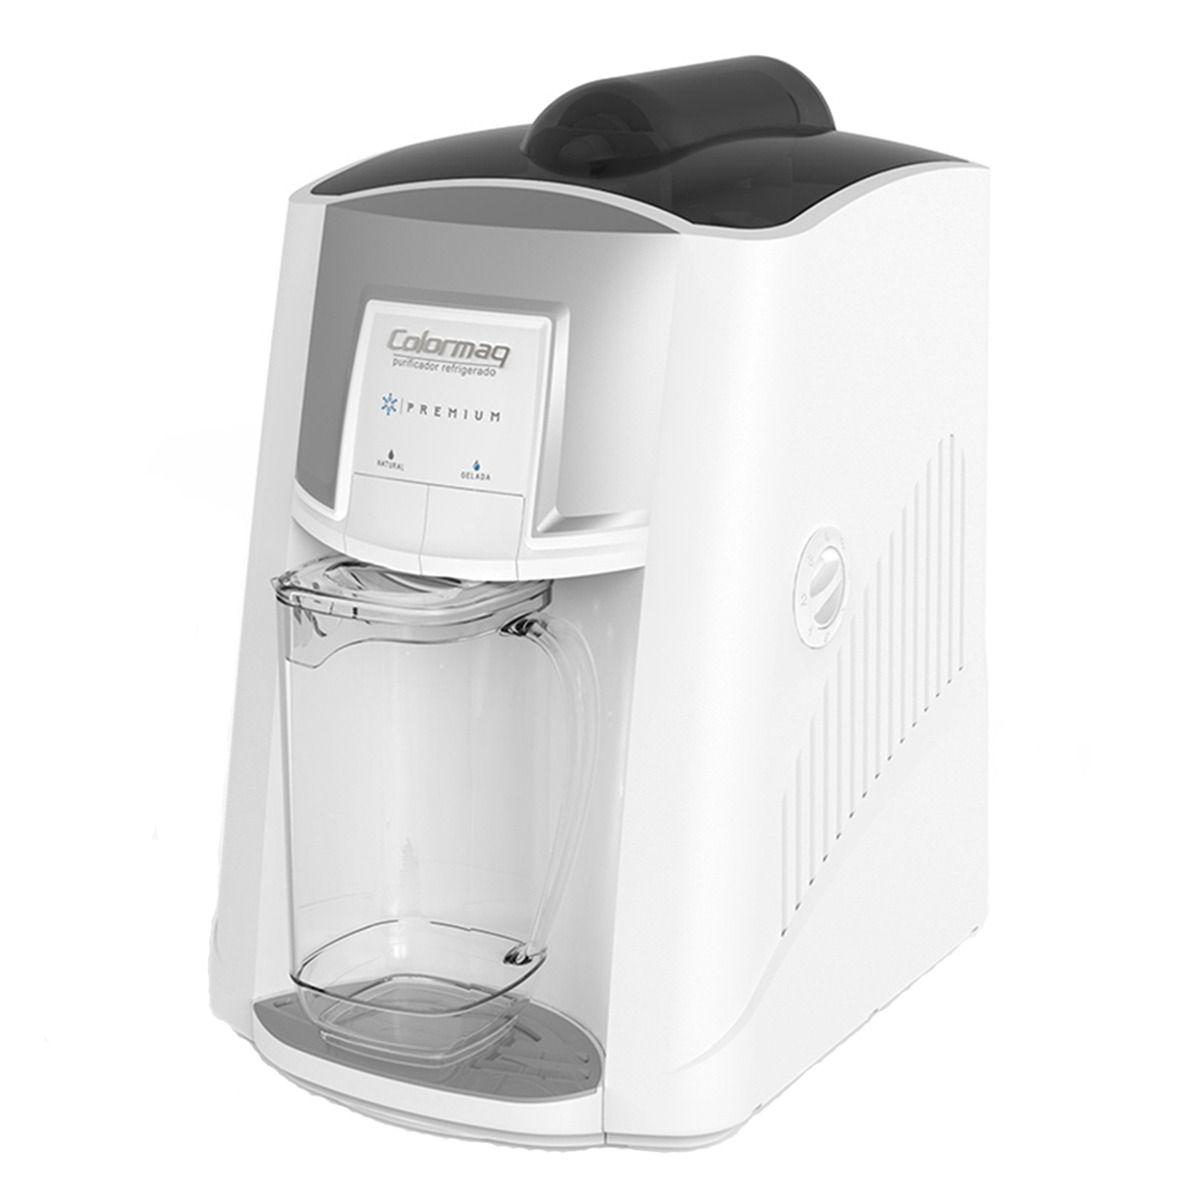 Purificador de Água Gelada Colormaq Premium Branco Compressor